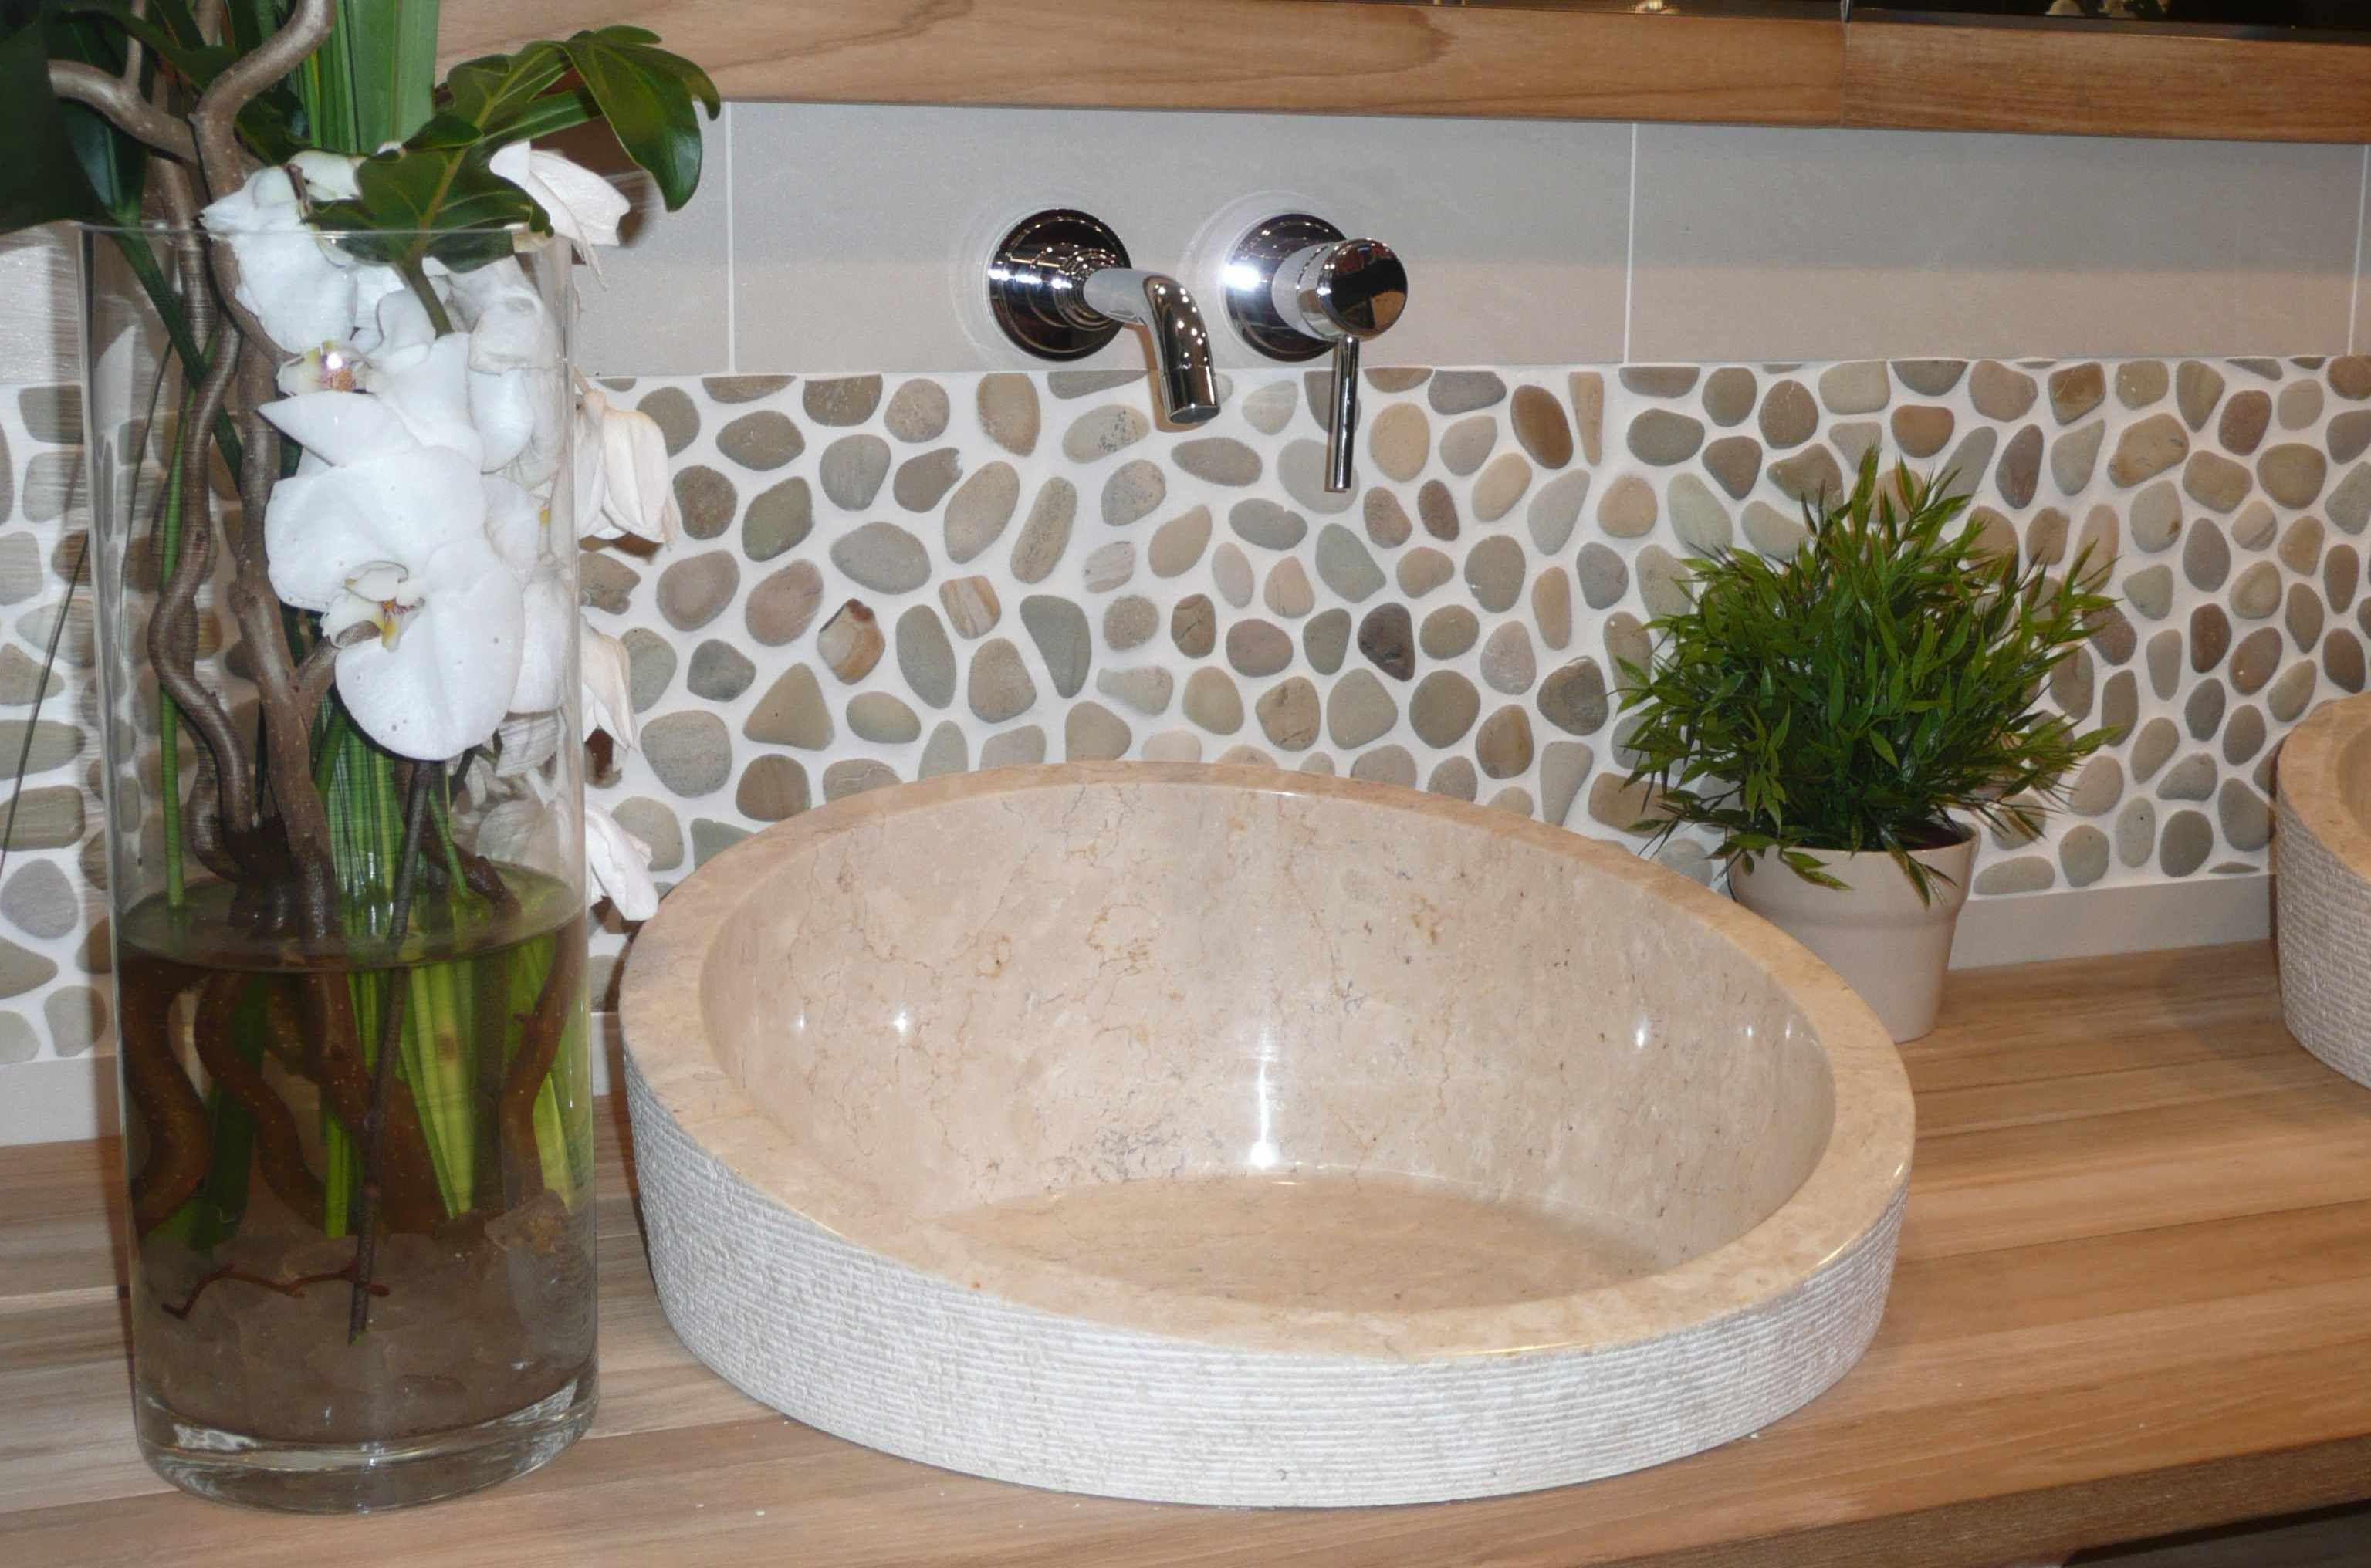 17 best images about salle de bain on pinterest contemporary bathrooms stone backsplash and bathroom shower tiles